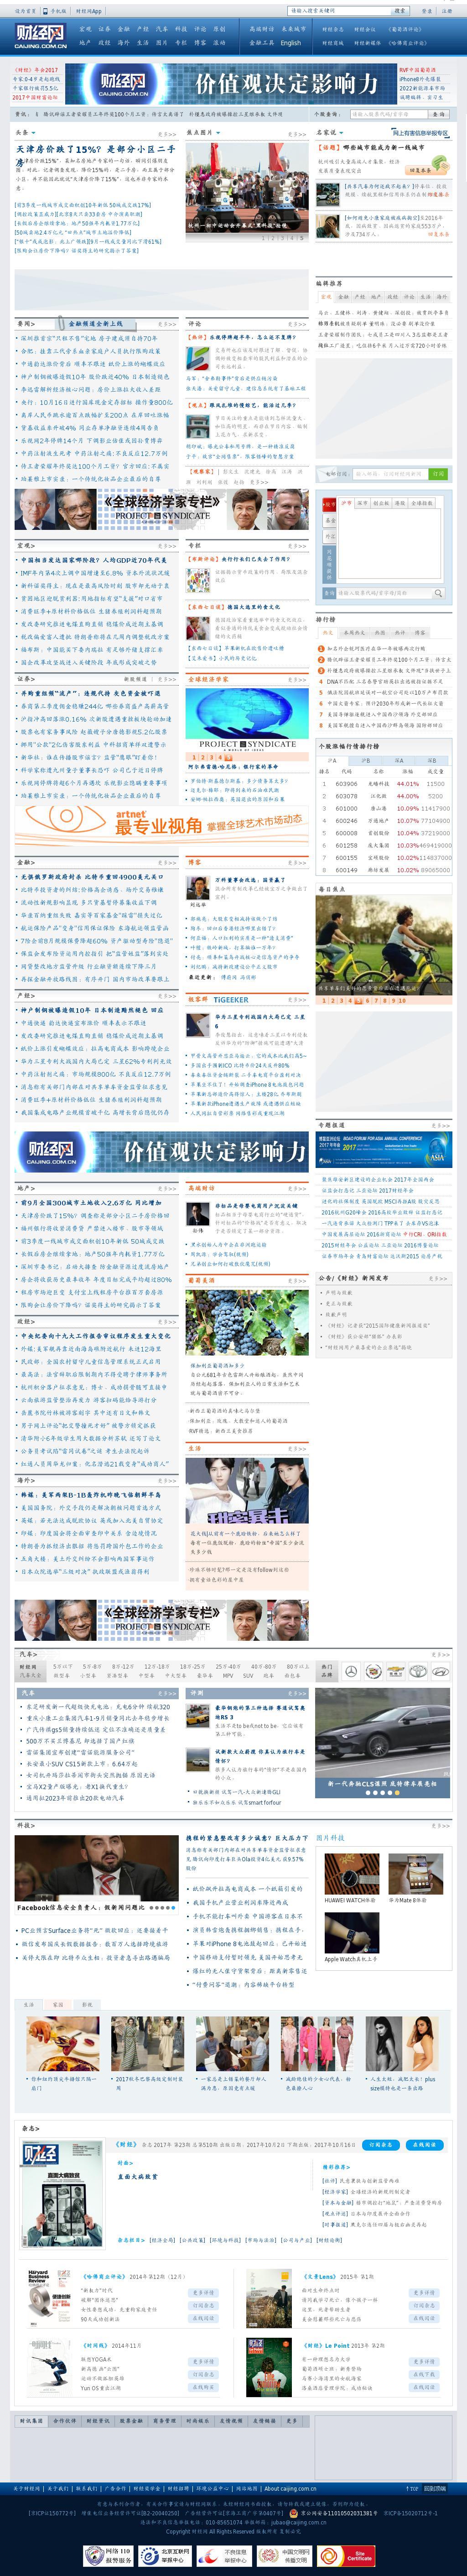 Caijing at Wednesday Oct. 11, 2017, 8 p.m. UTC